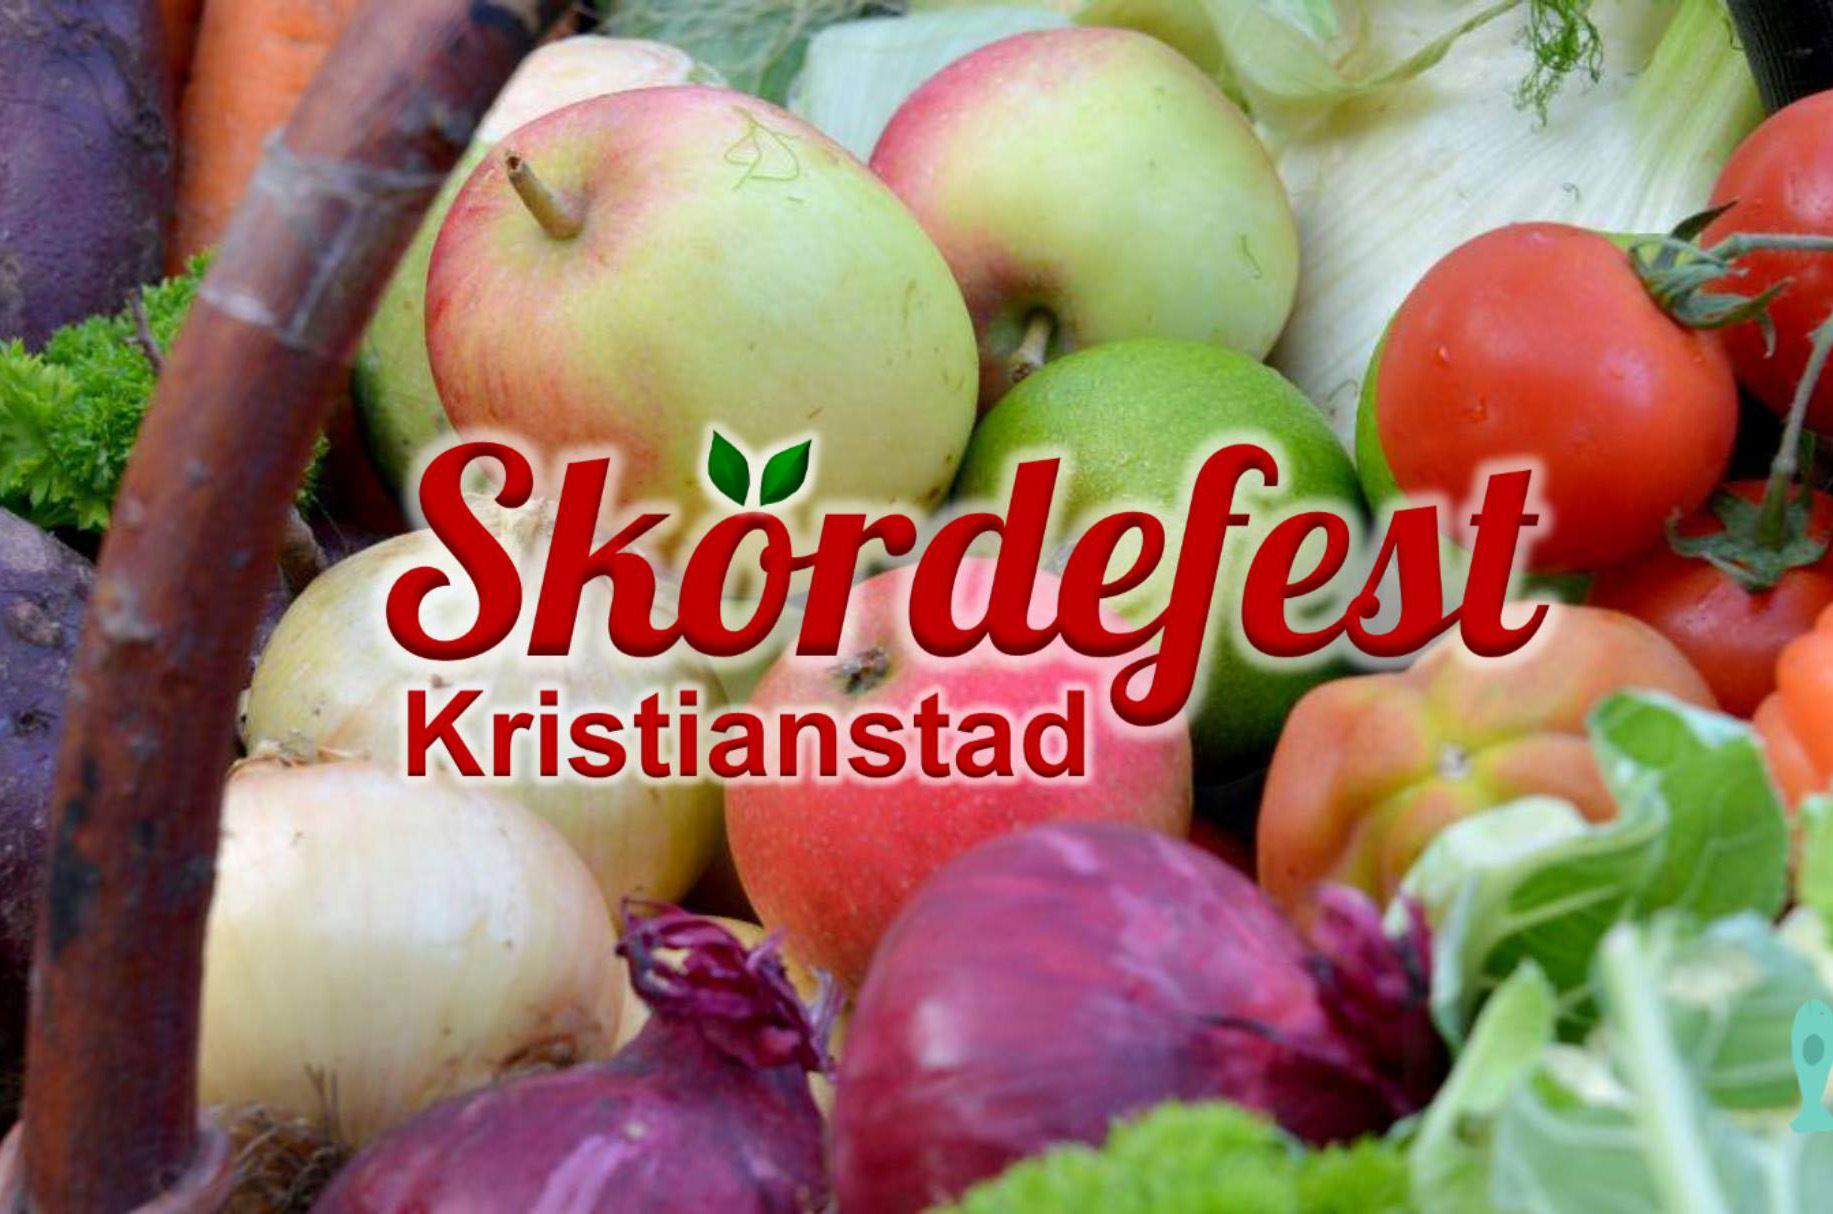 Skördefest Kristianstad 2017